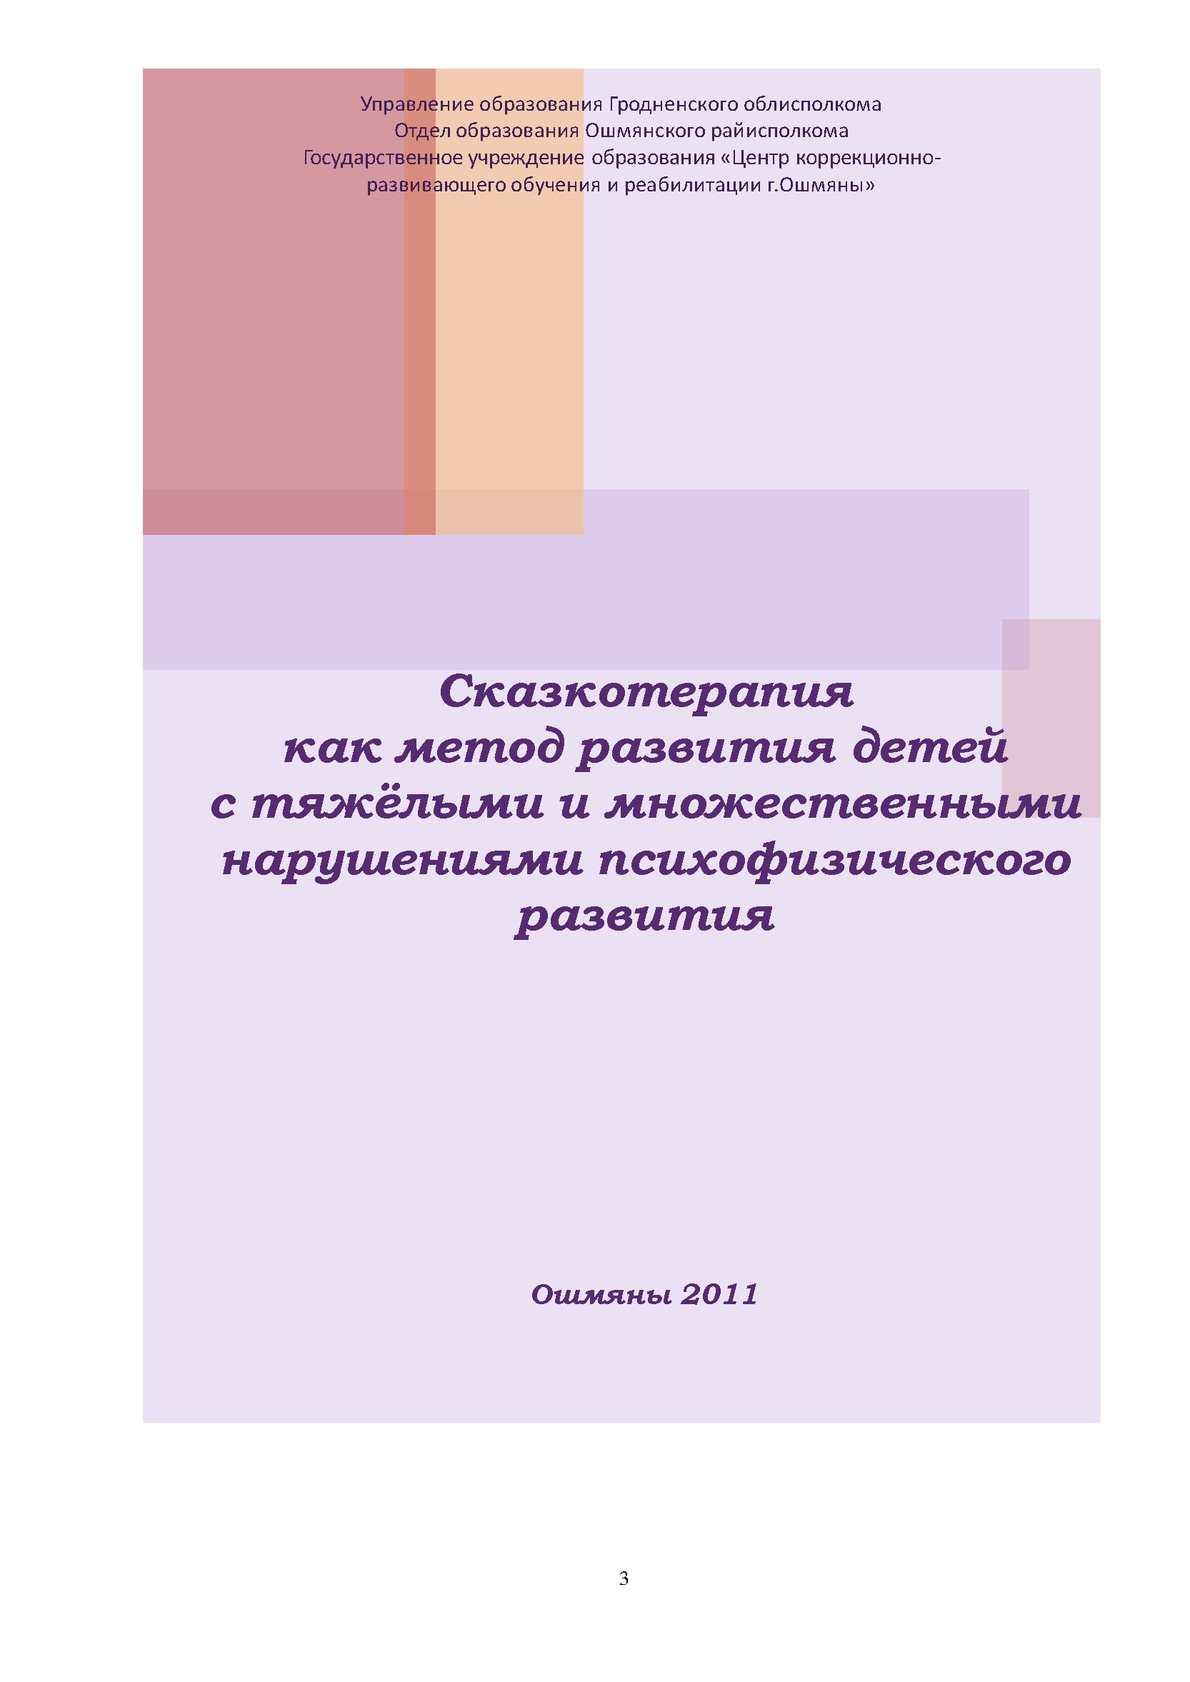 Сказкотерапия как метод развития детей с ТМНР.